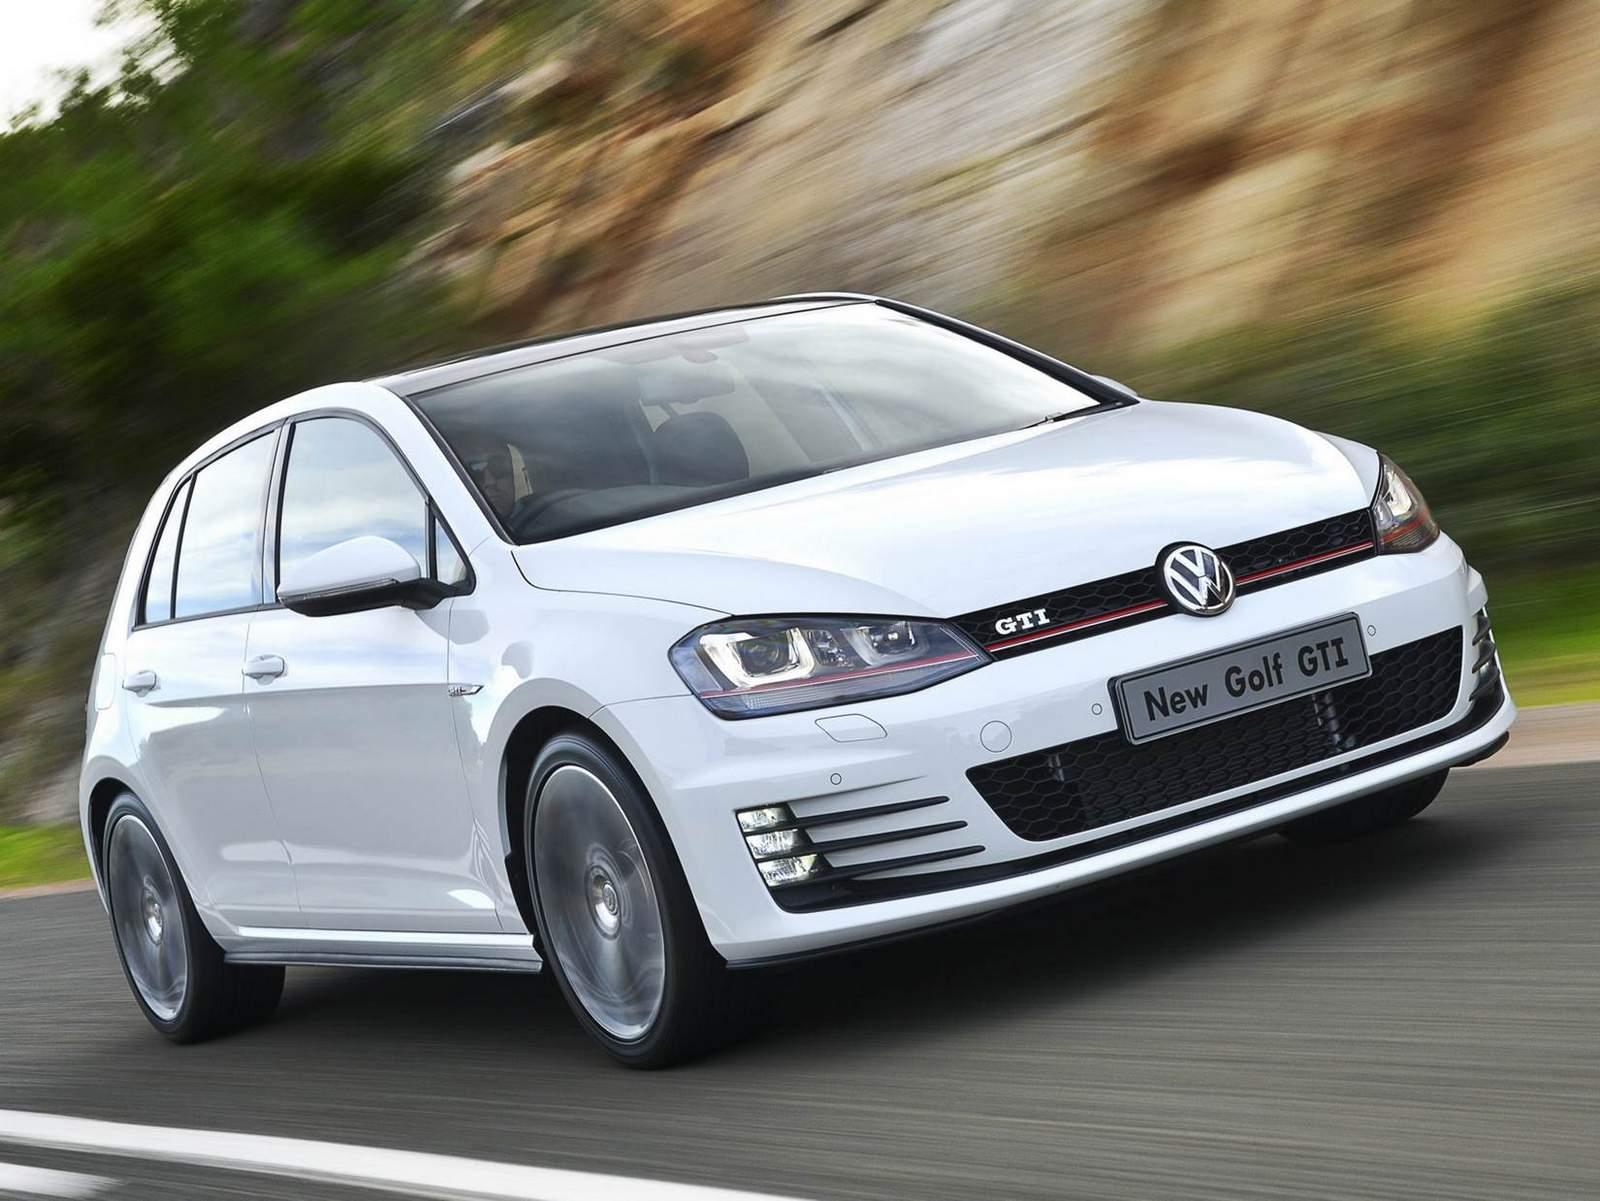 VW Golf GTI 2015 - Branco